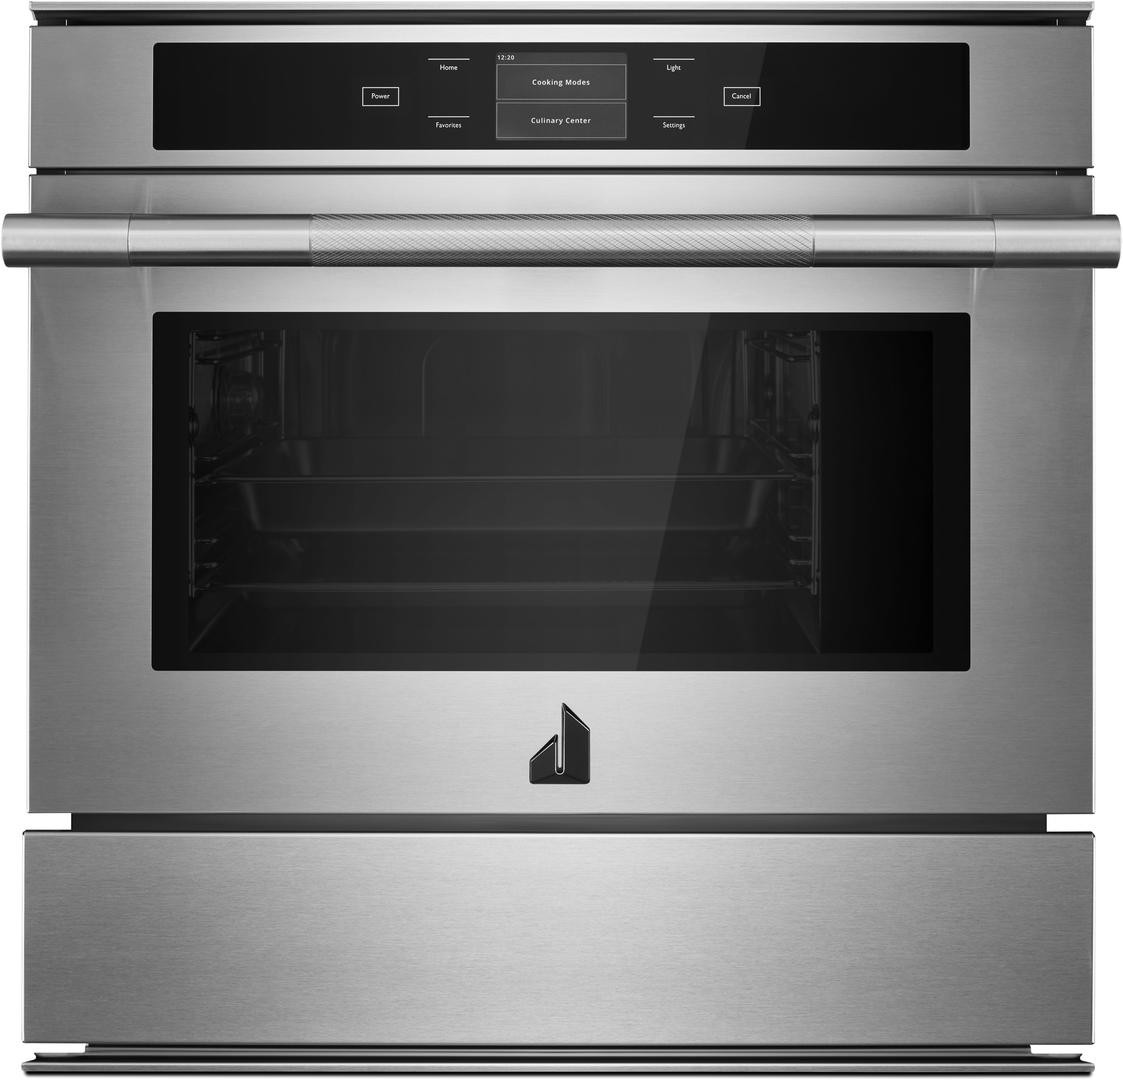 Jenn Air Microwave Oven Combo Manual Bestmicrowave